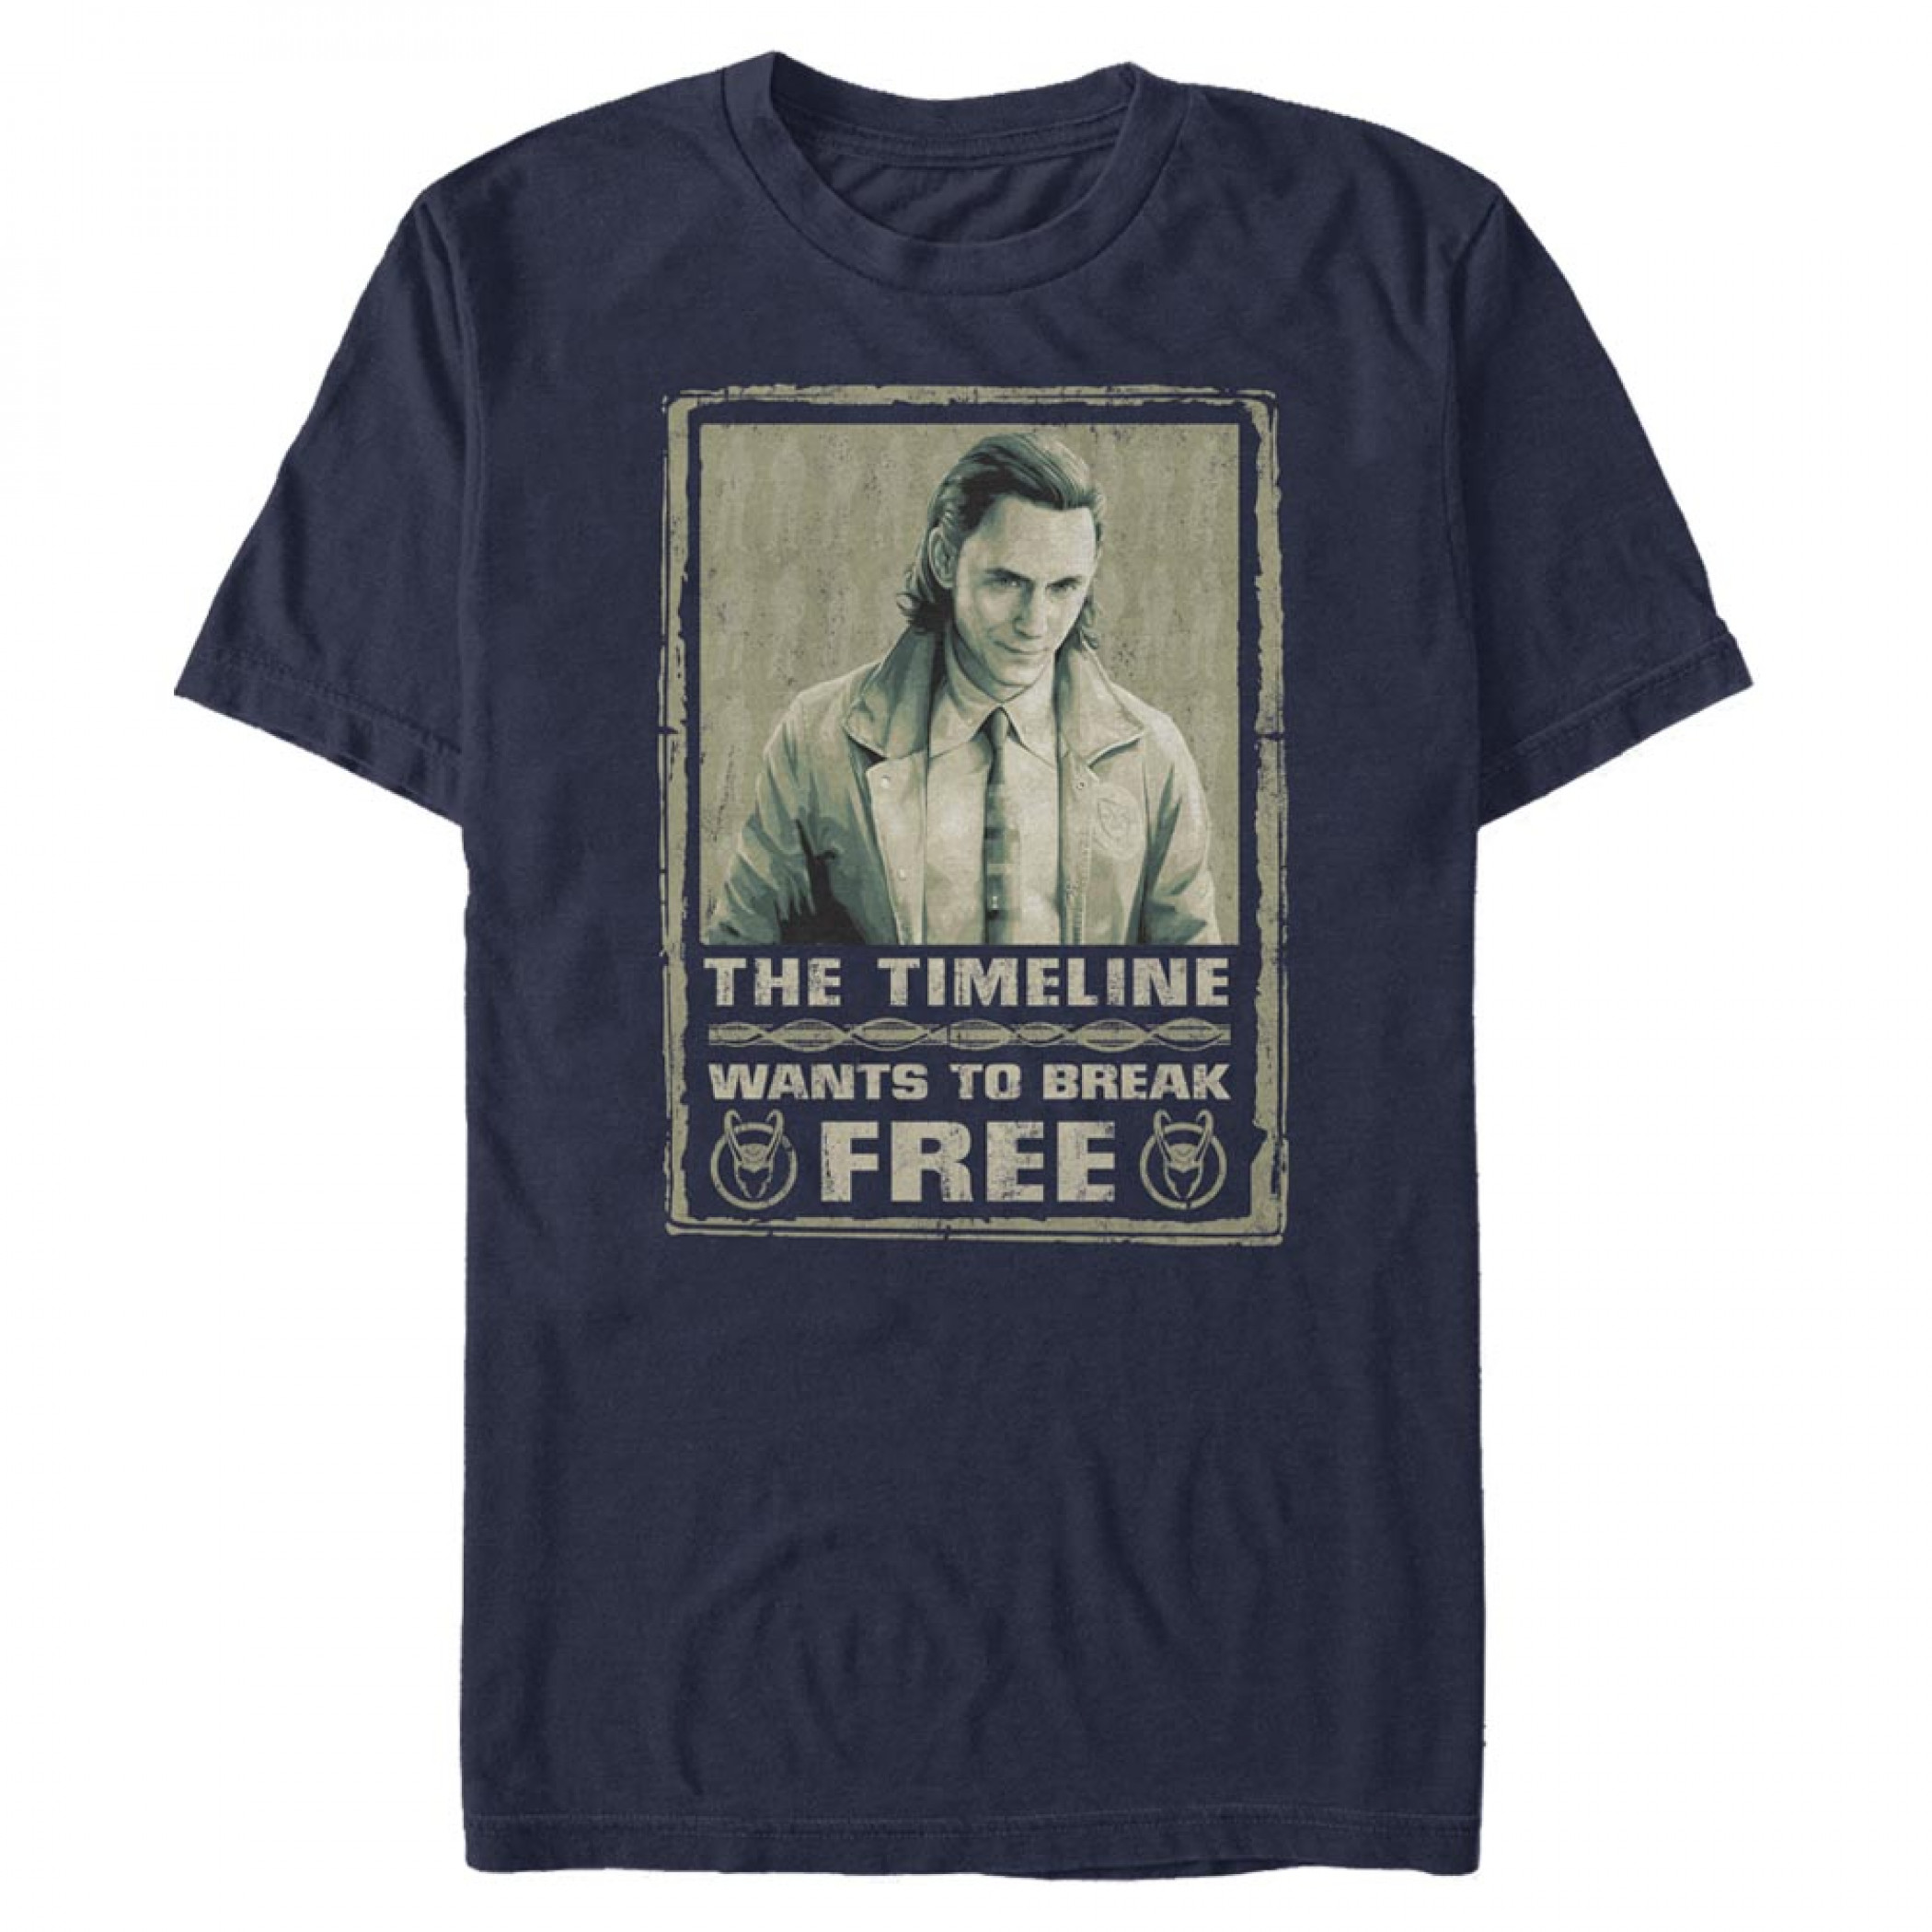 Loki The Timeline Wants To Break Free T-Shirt